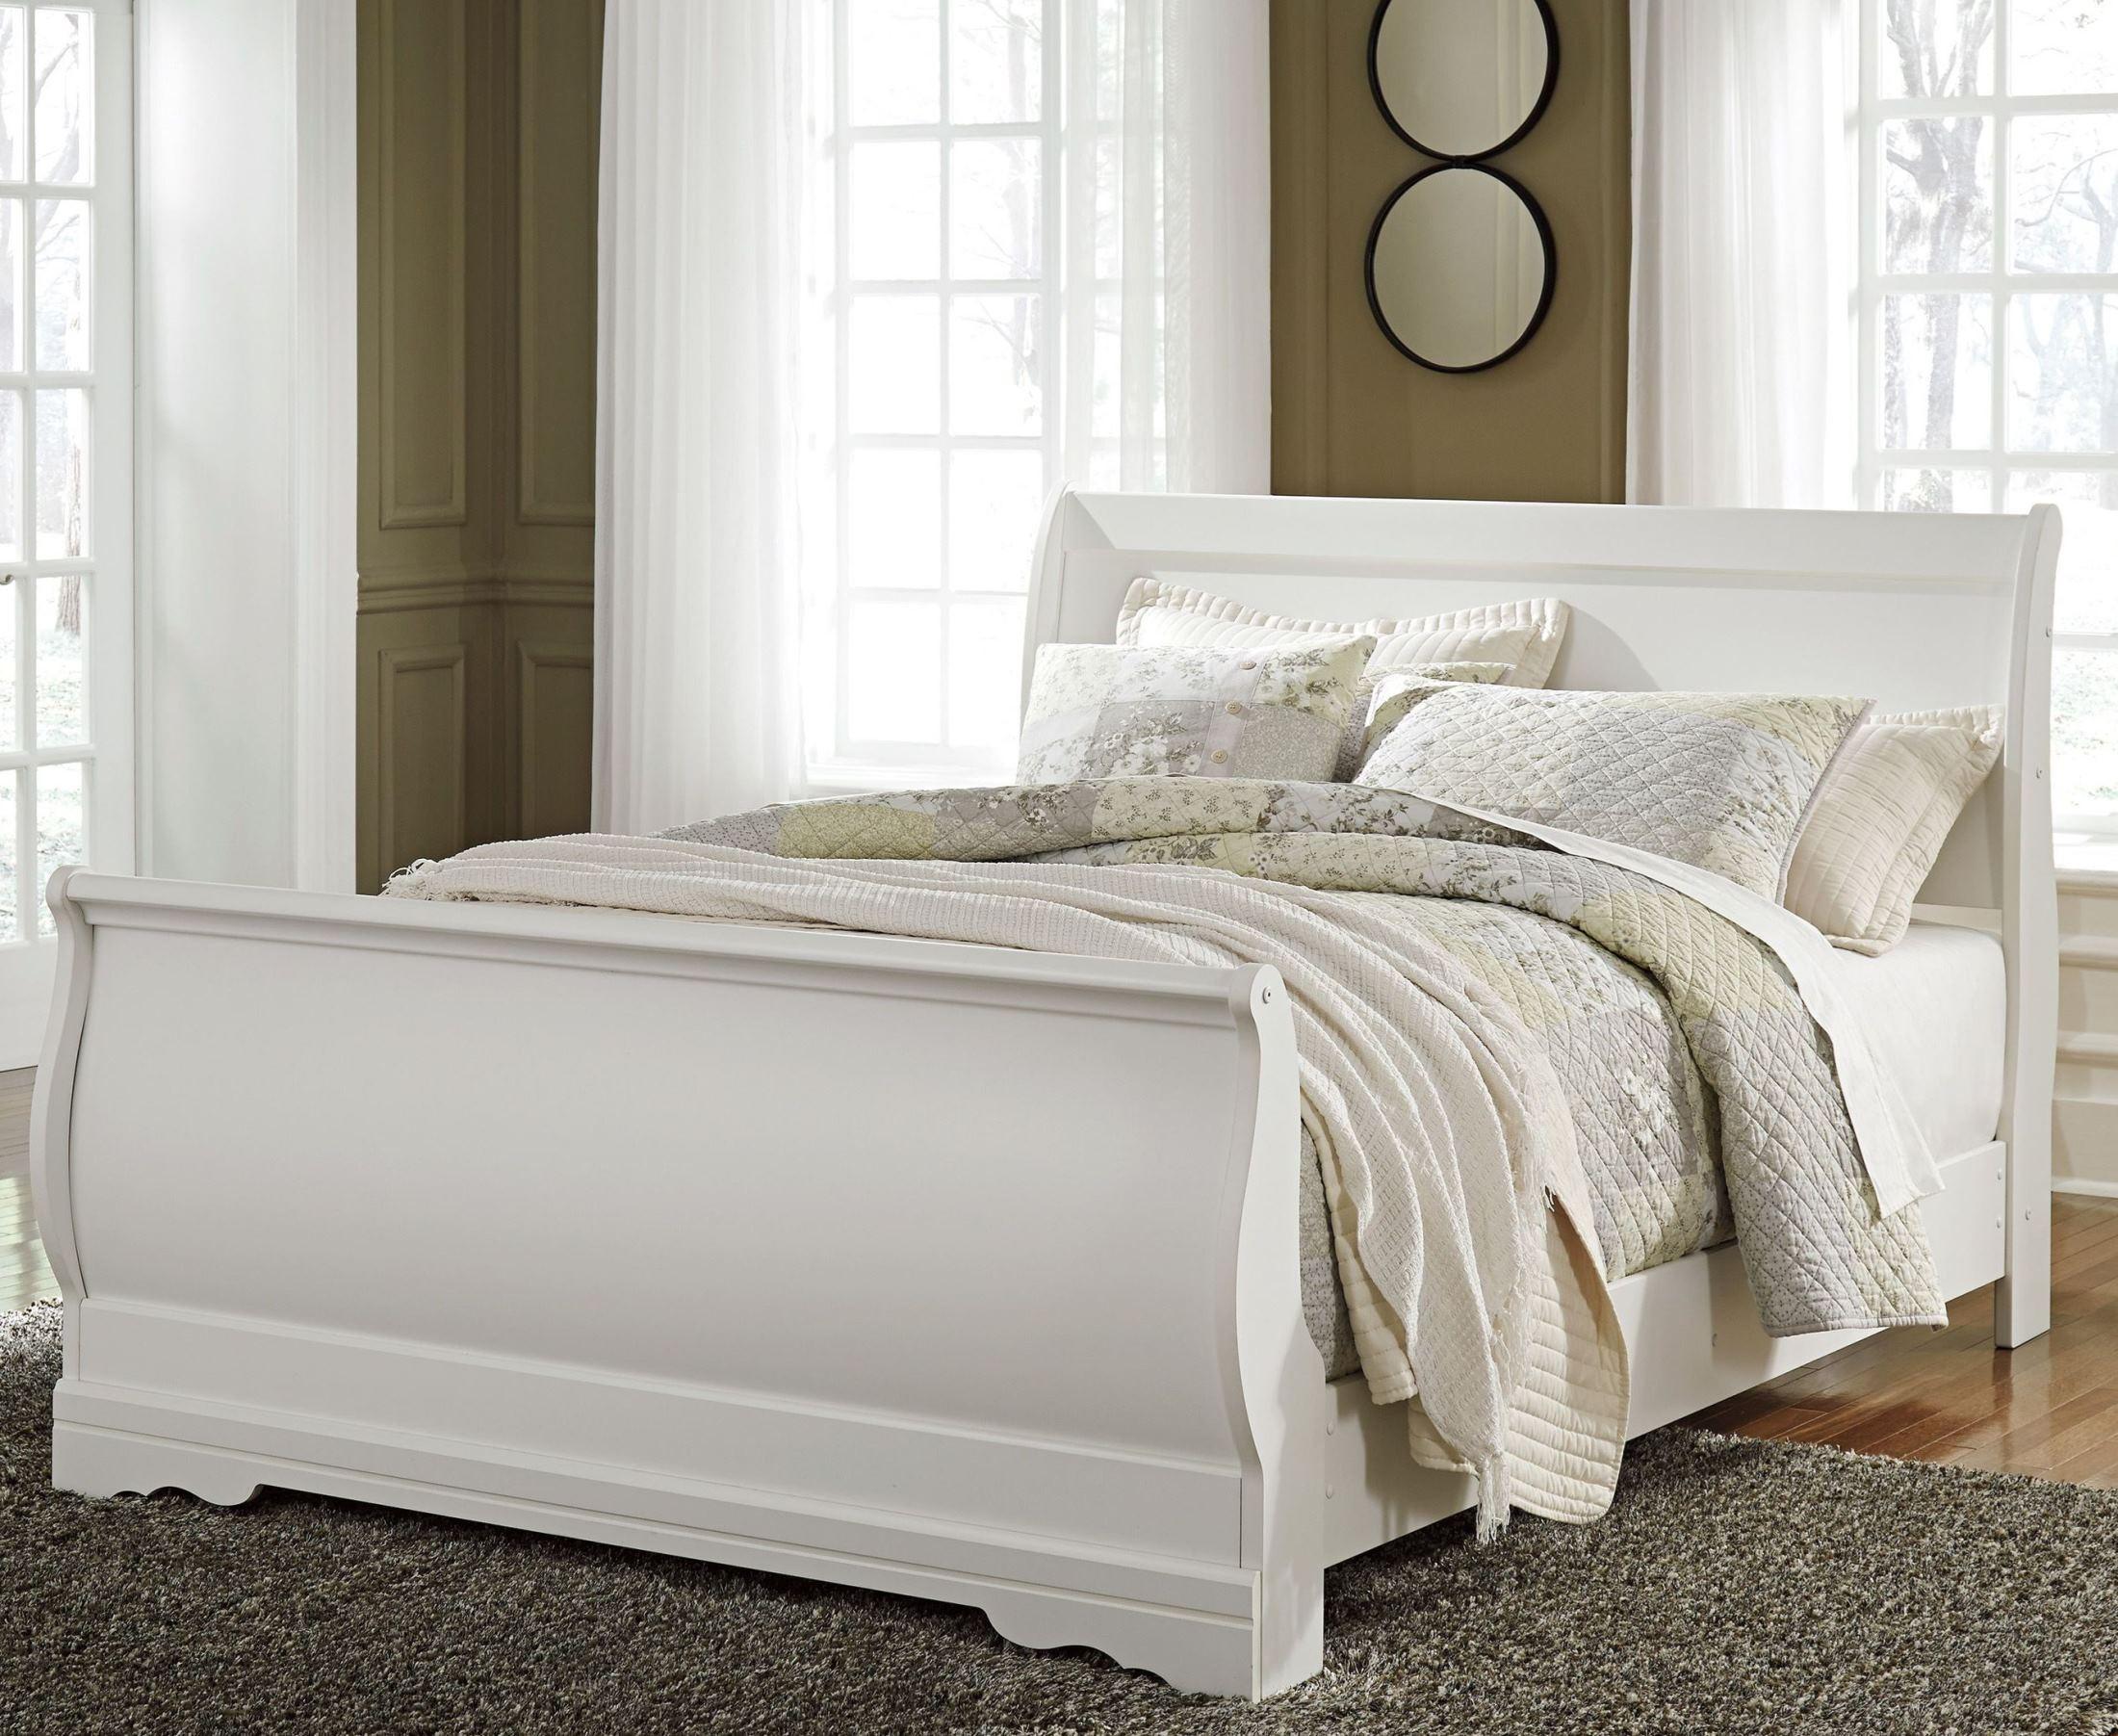 Anarasia white twin sleigh bed b129 63 62 82 ashley Twin sleigh bed